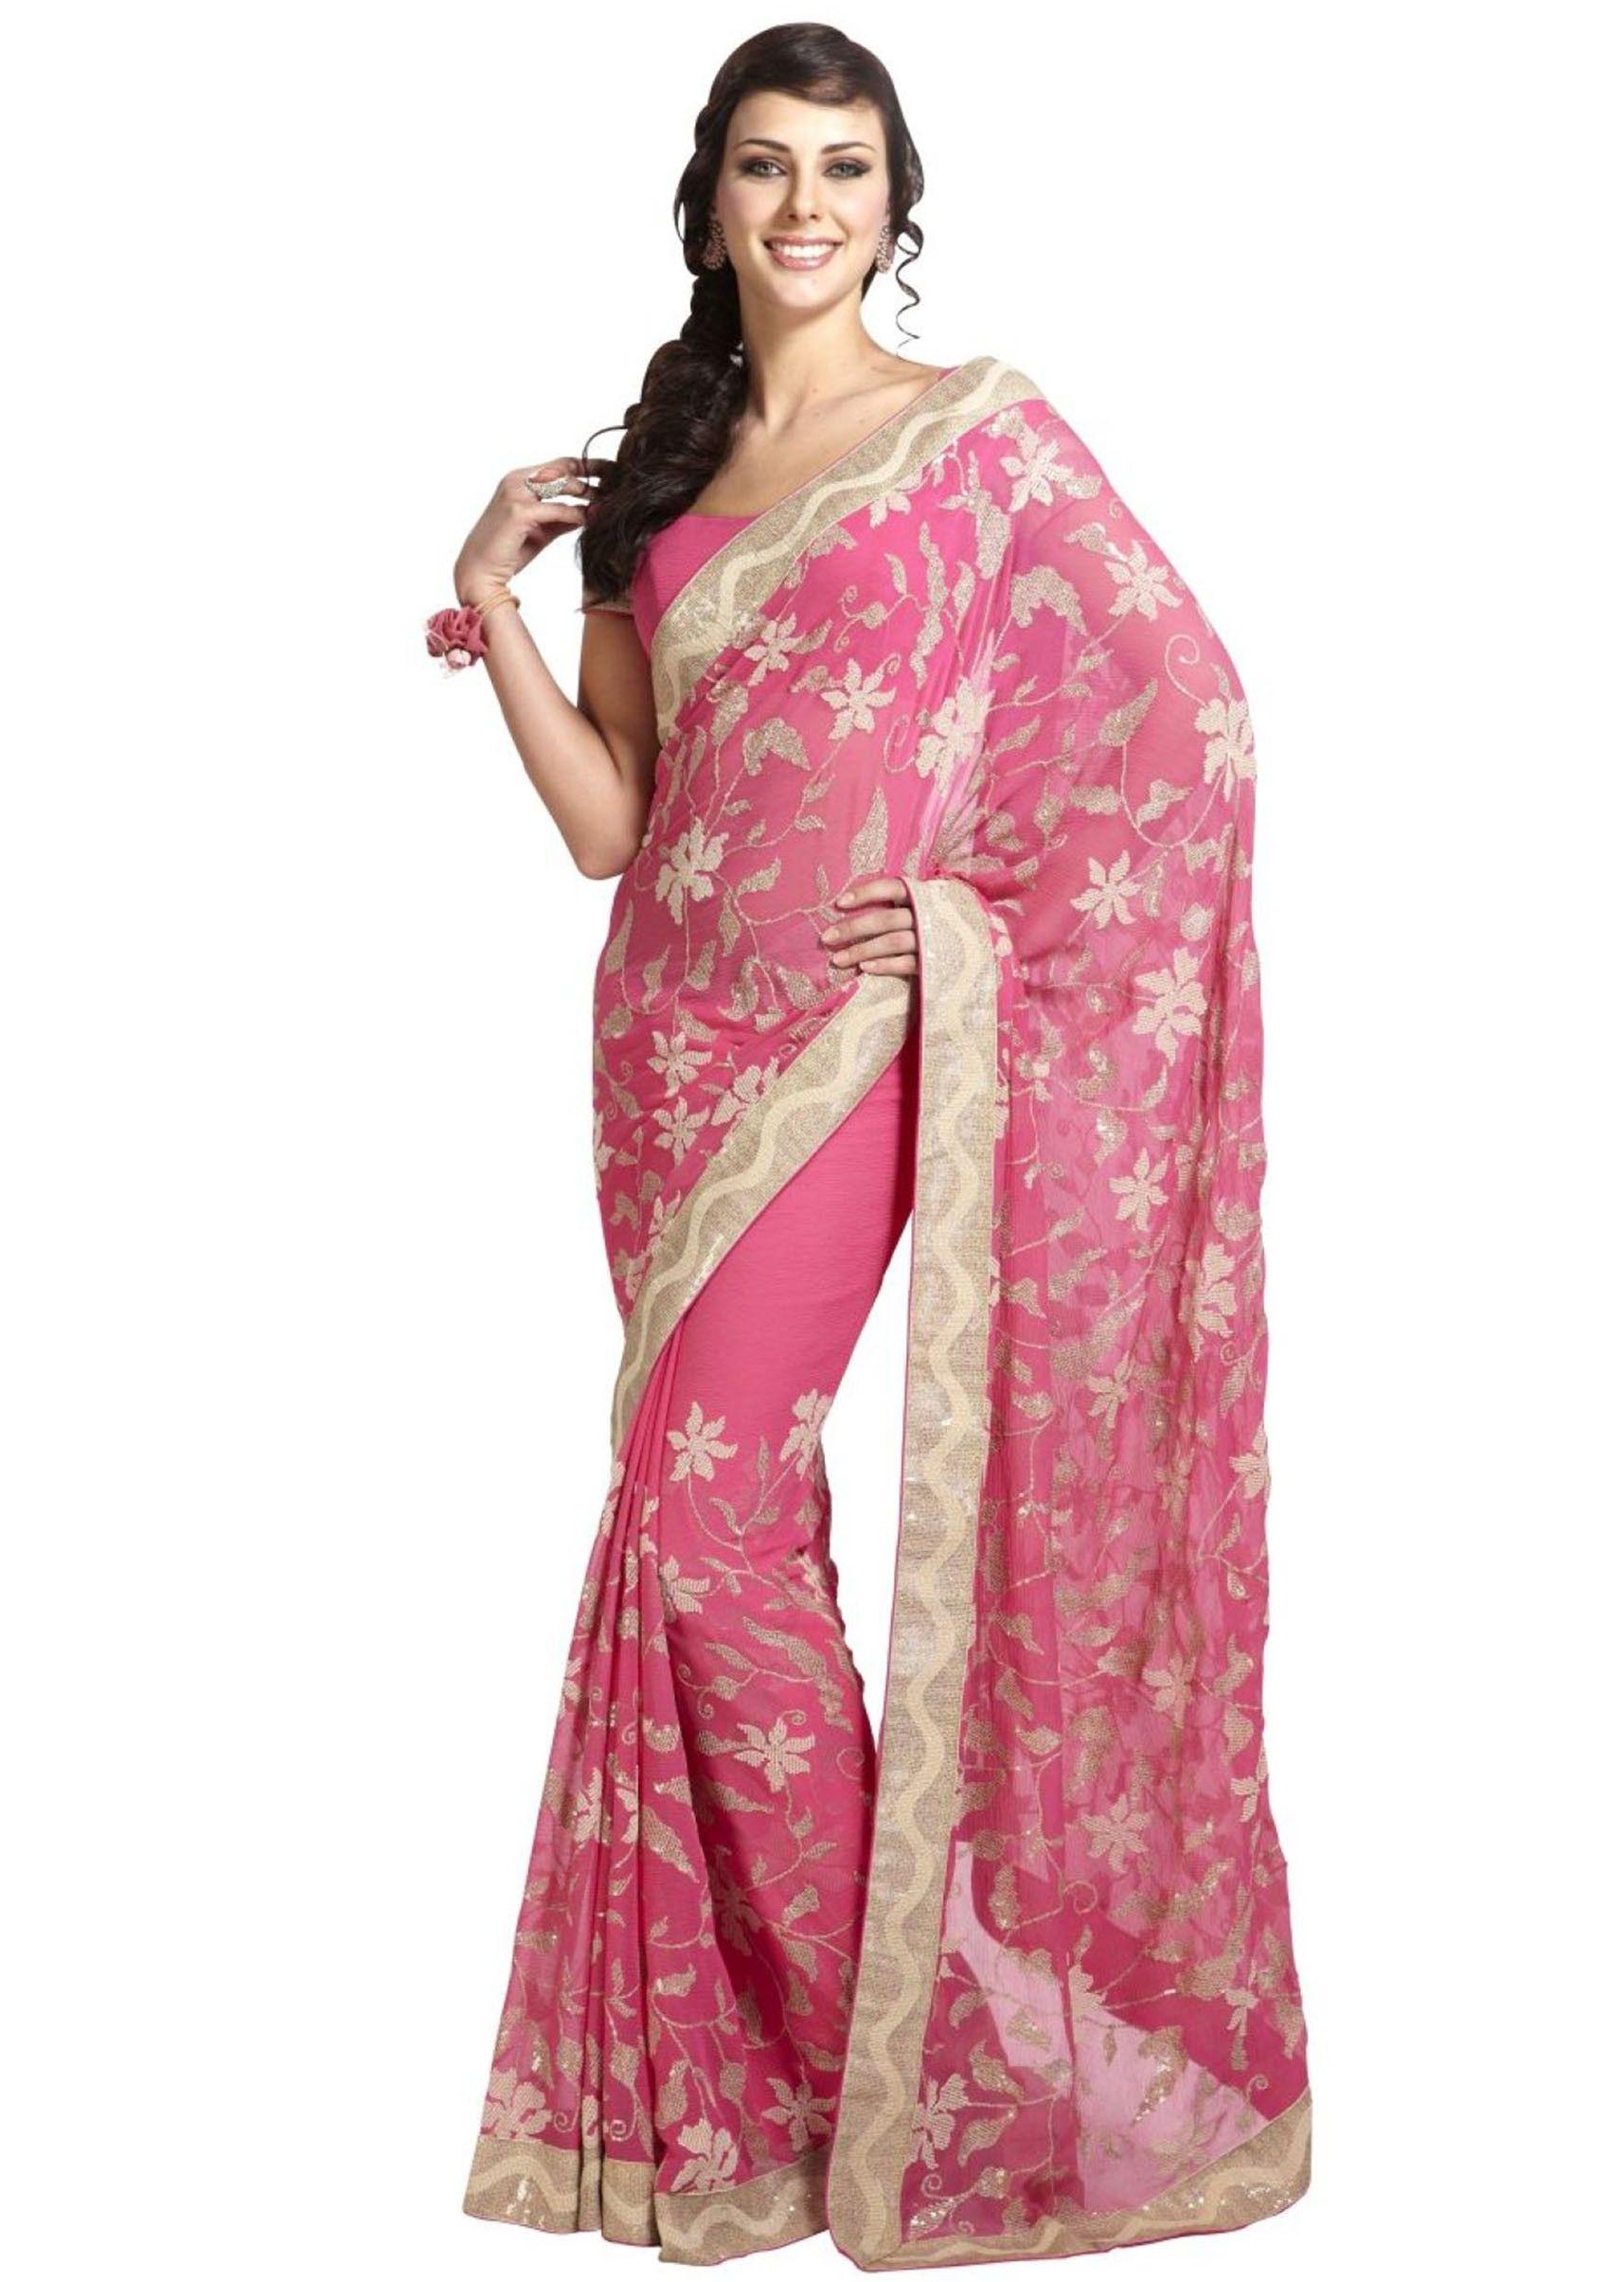 Latest Fashion Blog - Ewows - All About Ethnic Dressing - Designer ...